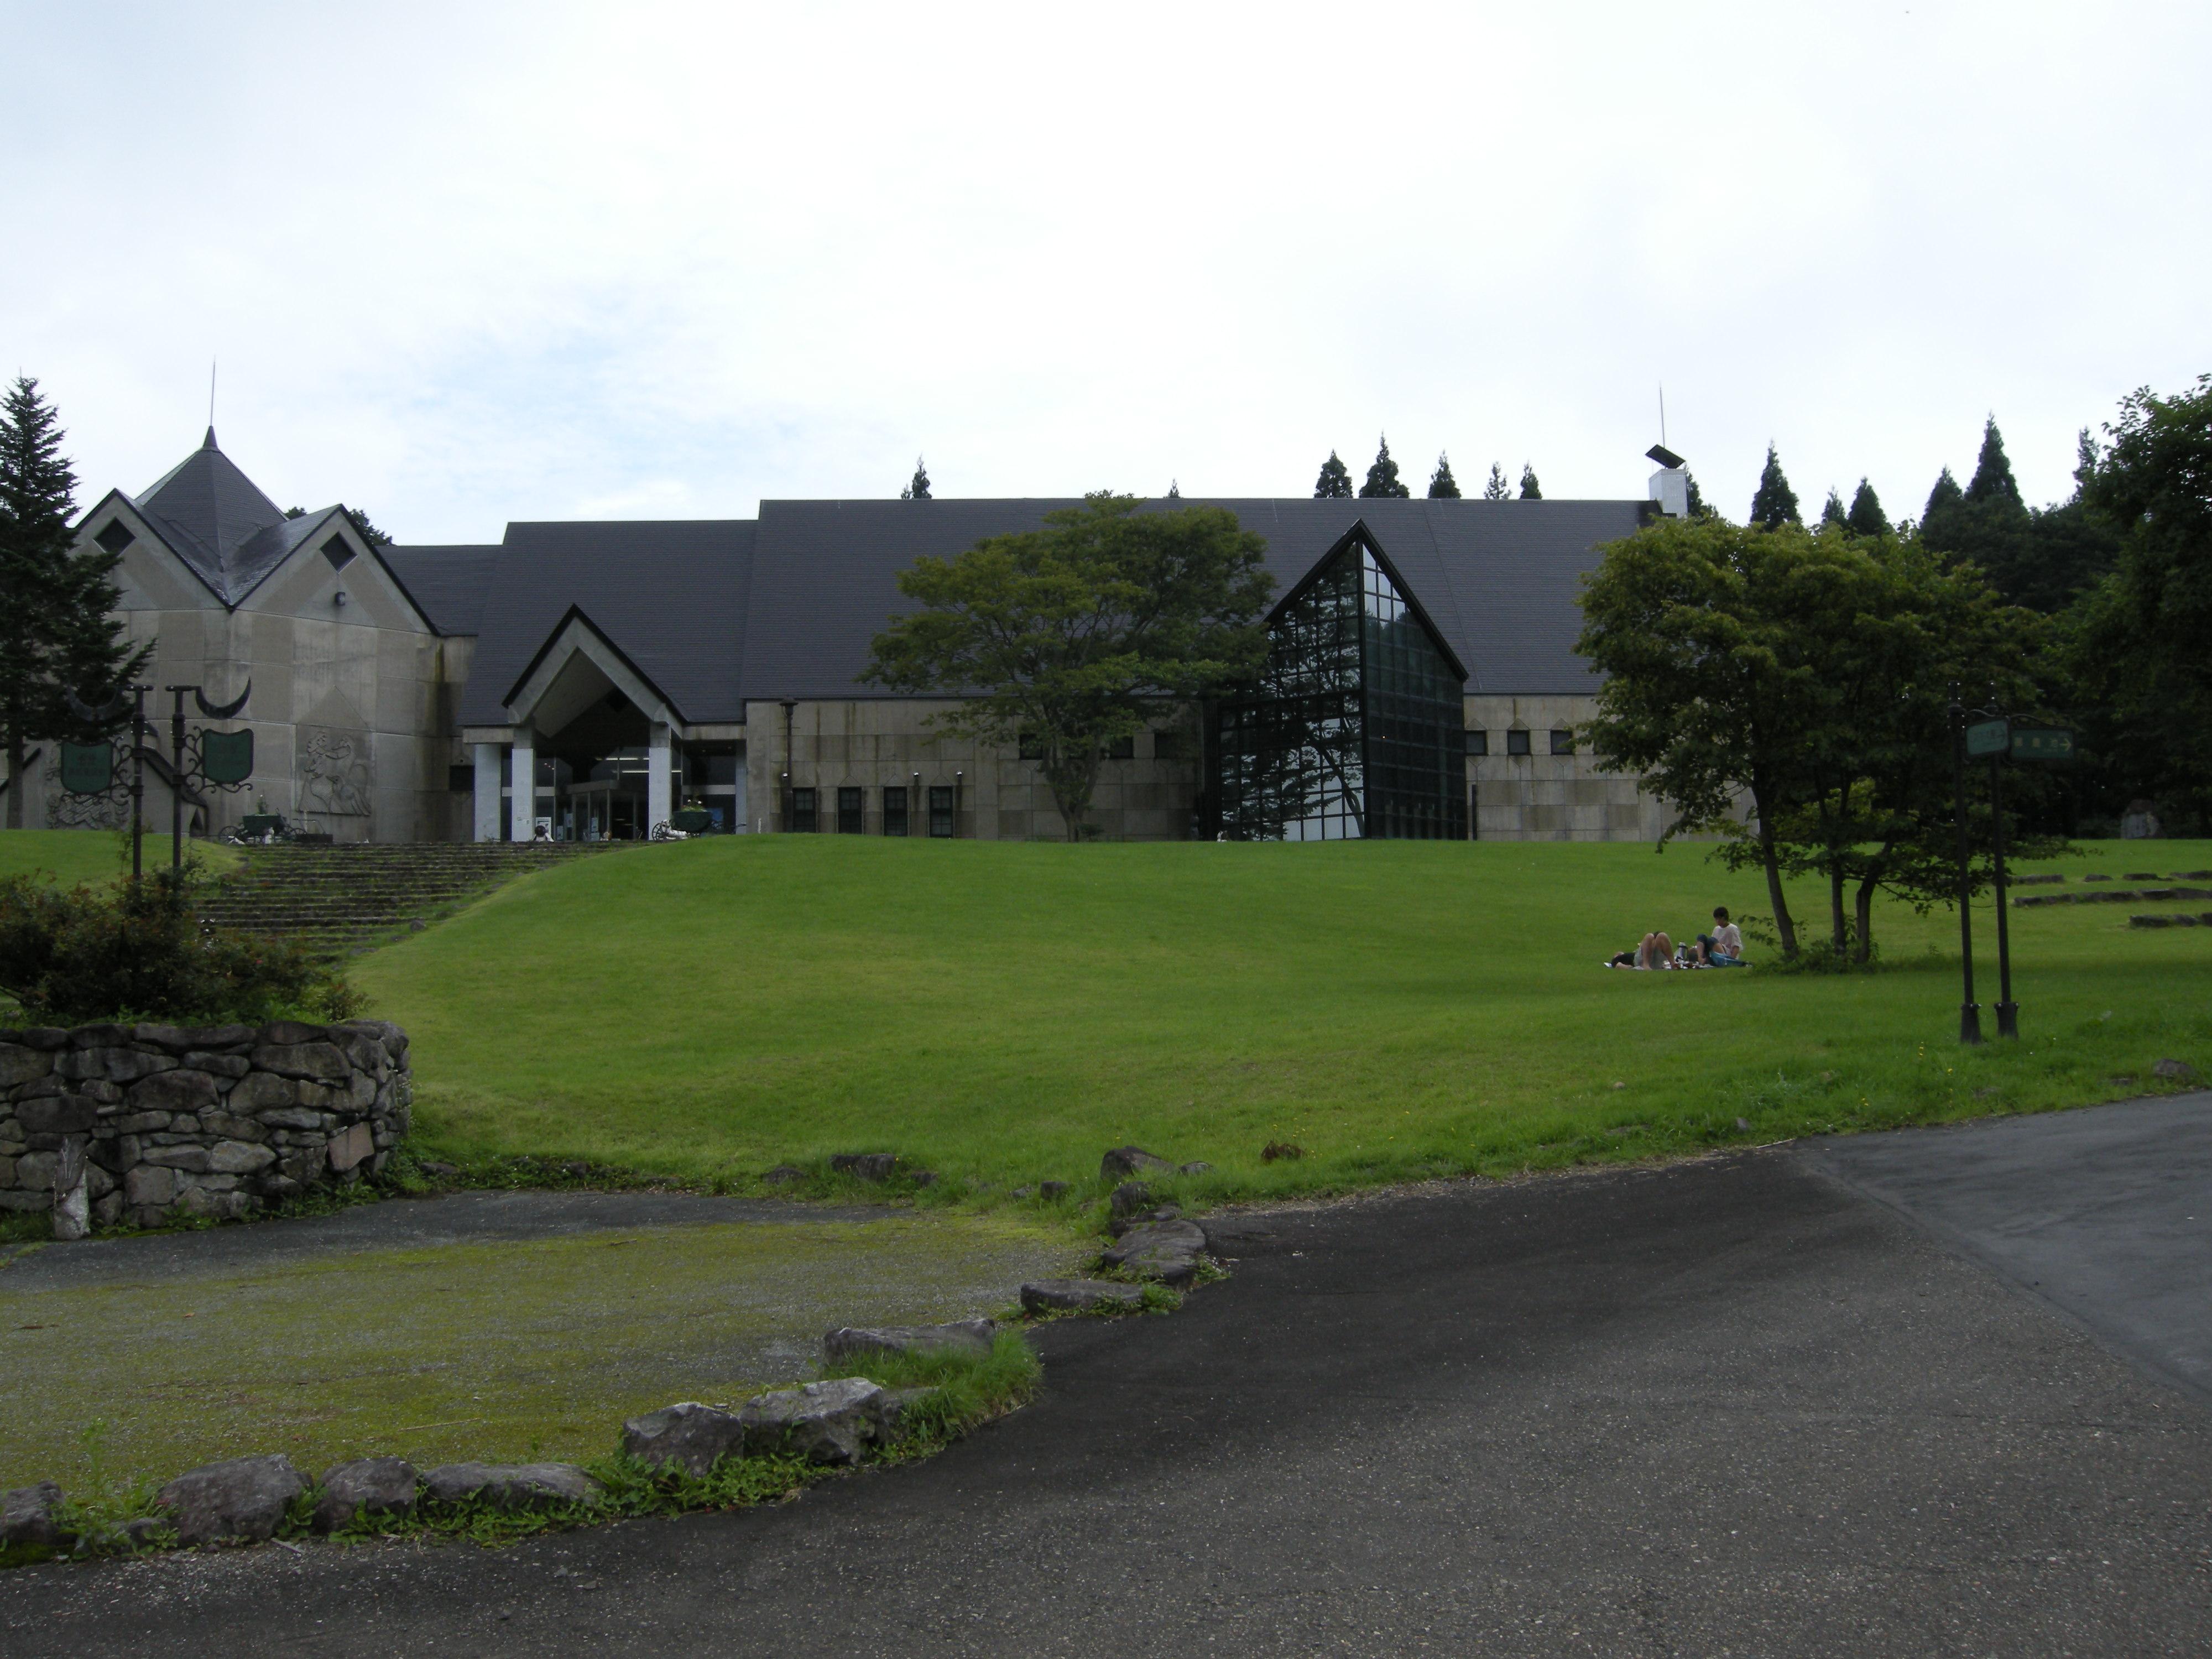 黒姫童話館 - Wikipedia